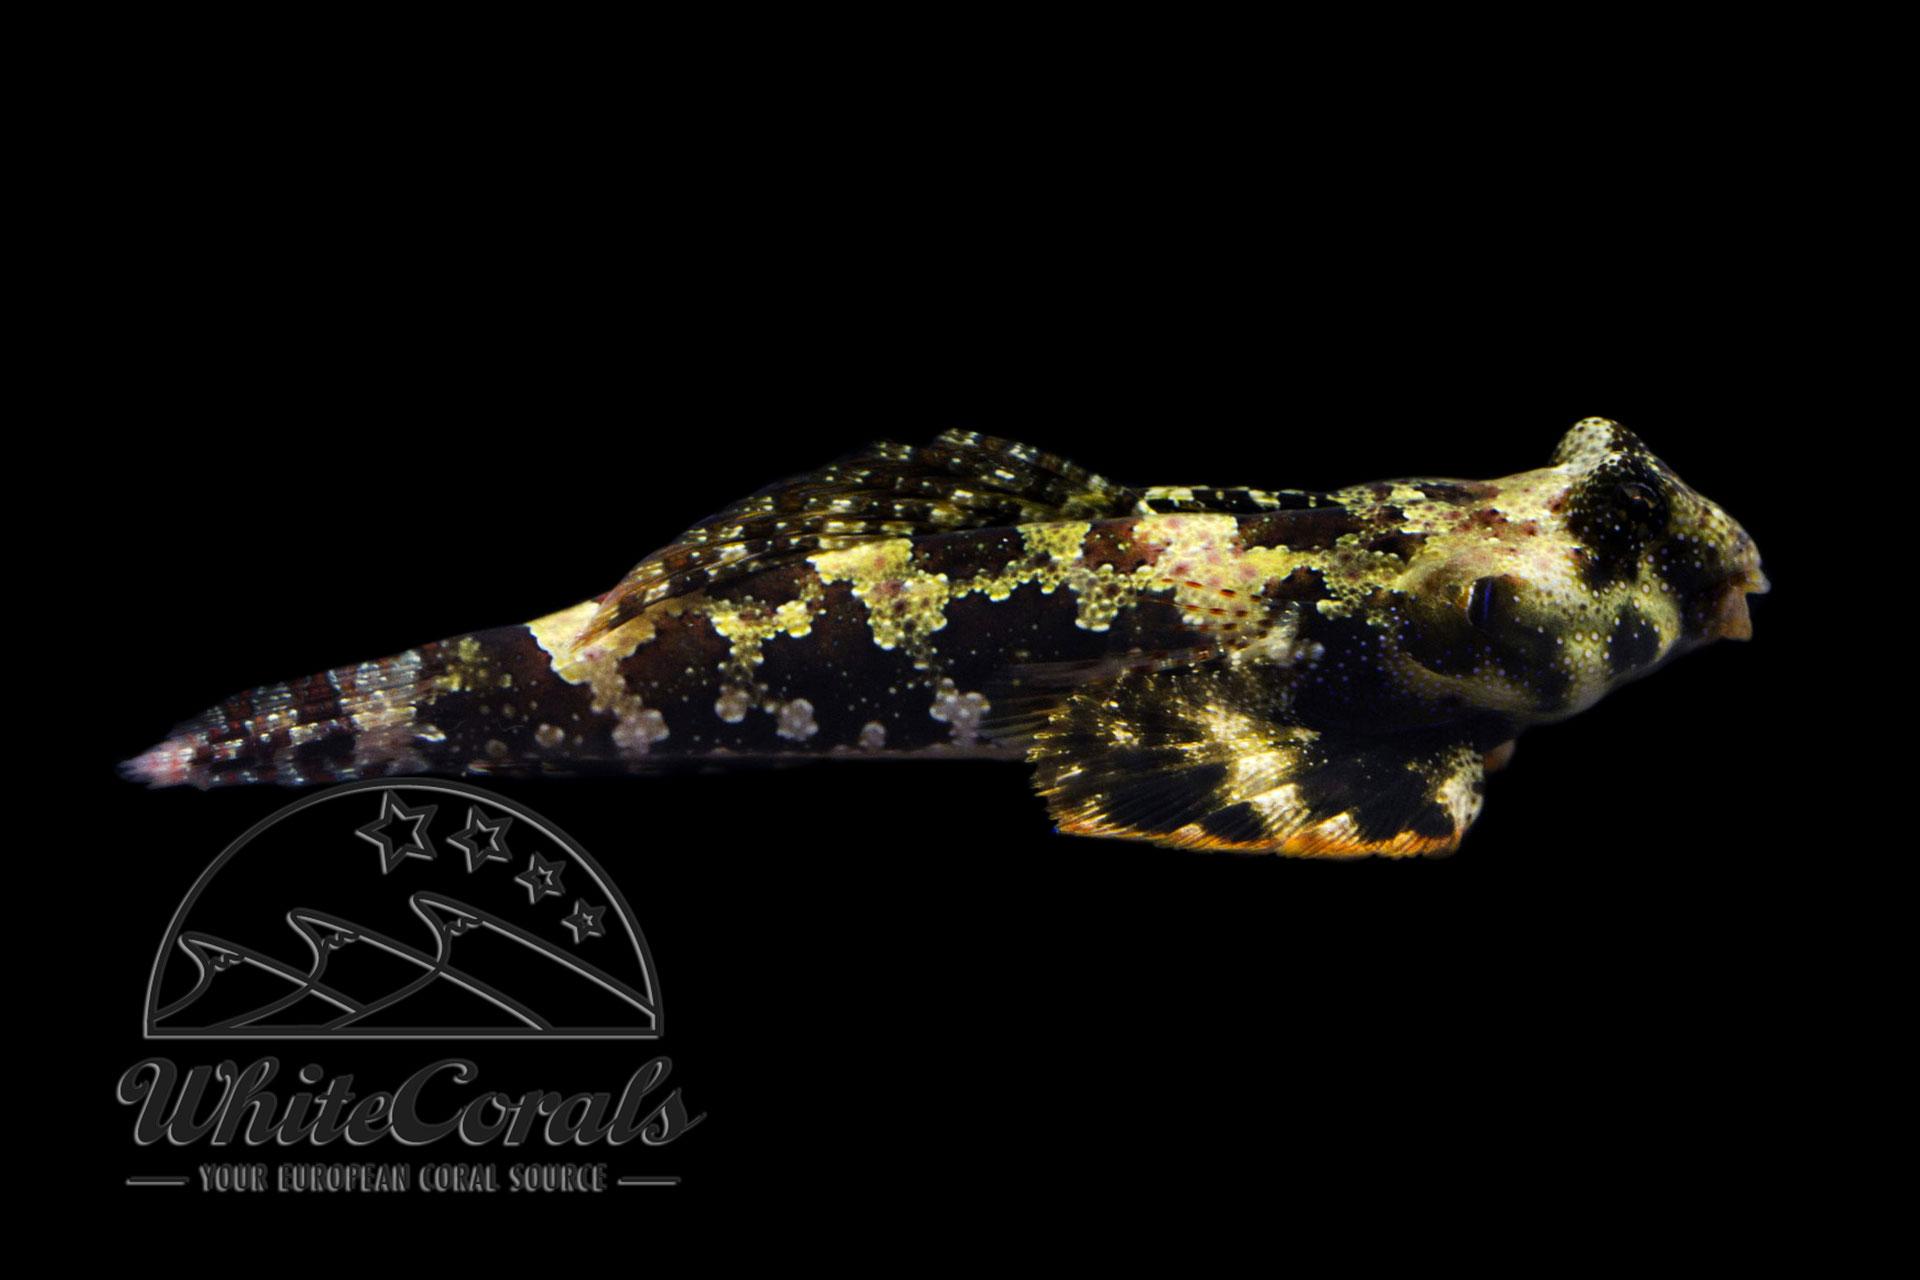 Synchiropus ocellatus - Augenfleck Mandarinfisch